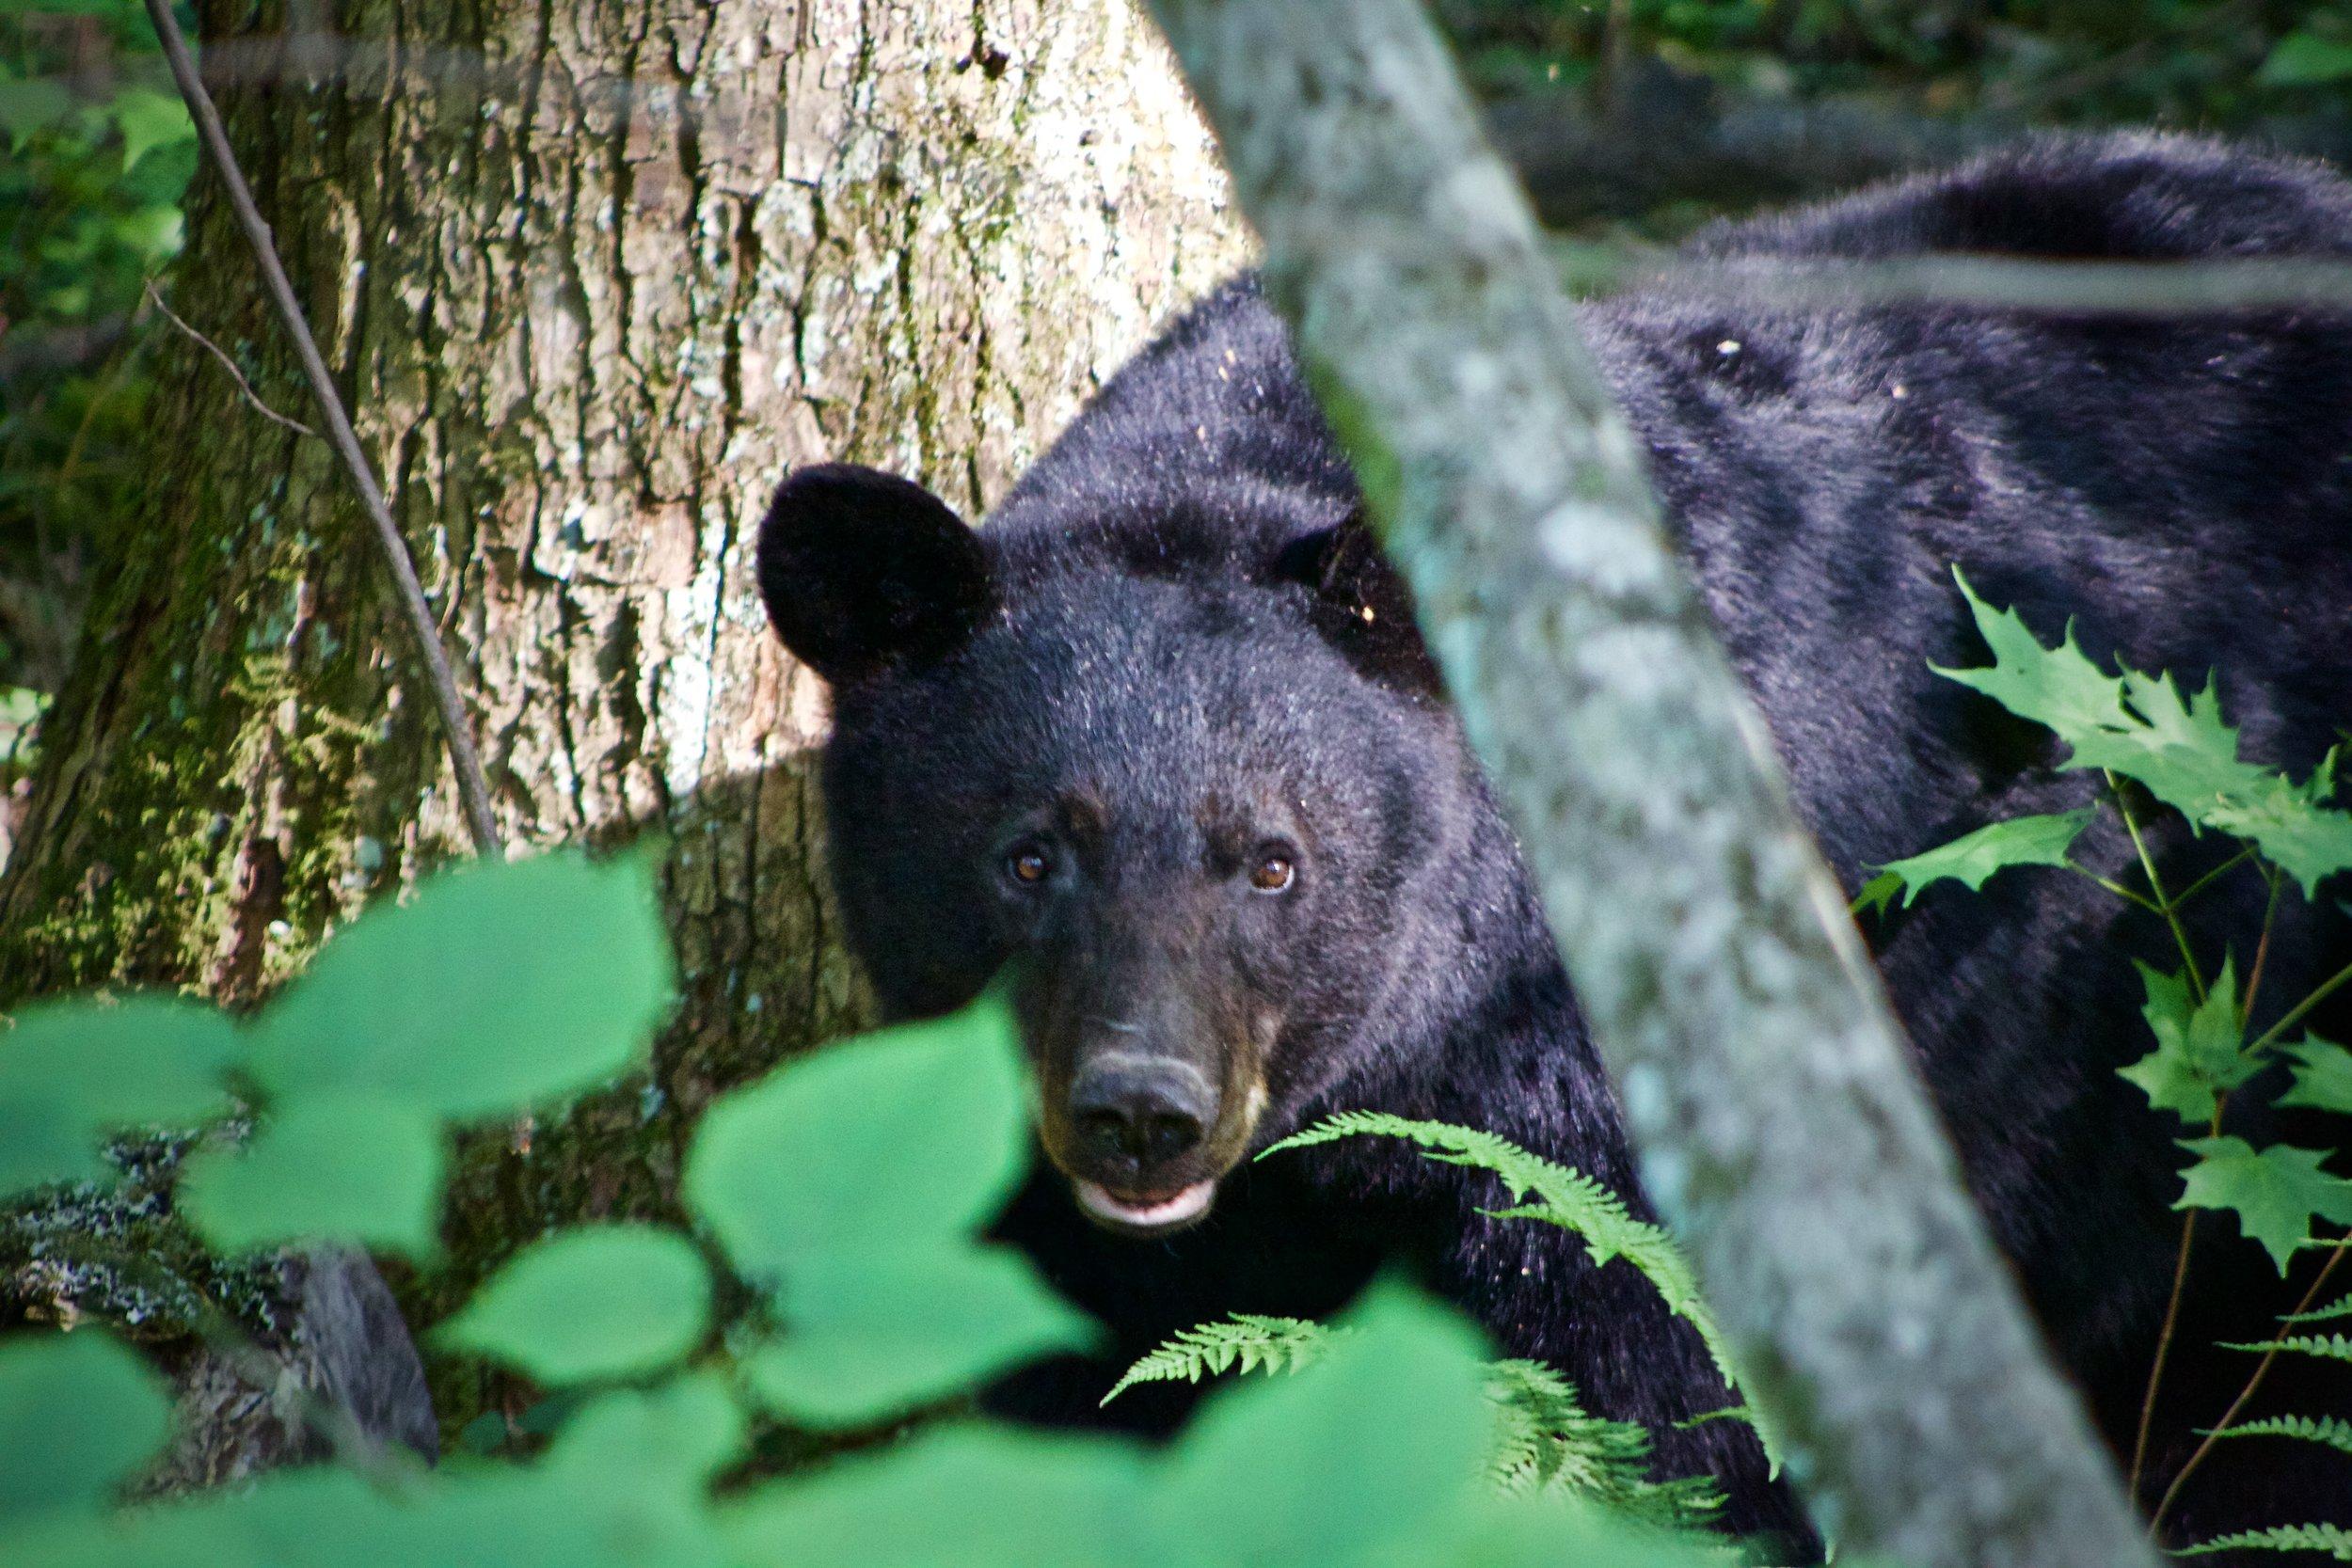 Black Bear Great Smoky Mountain National Park.